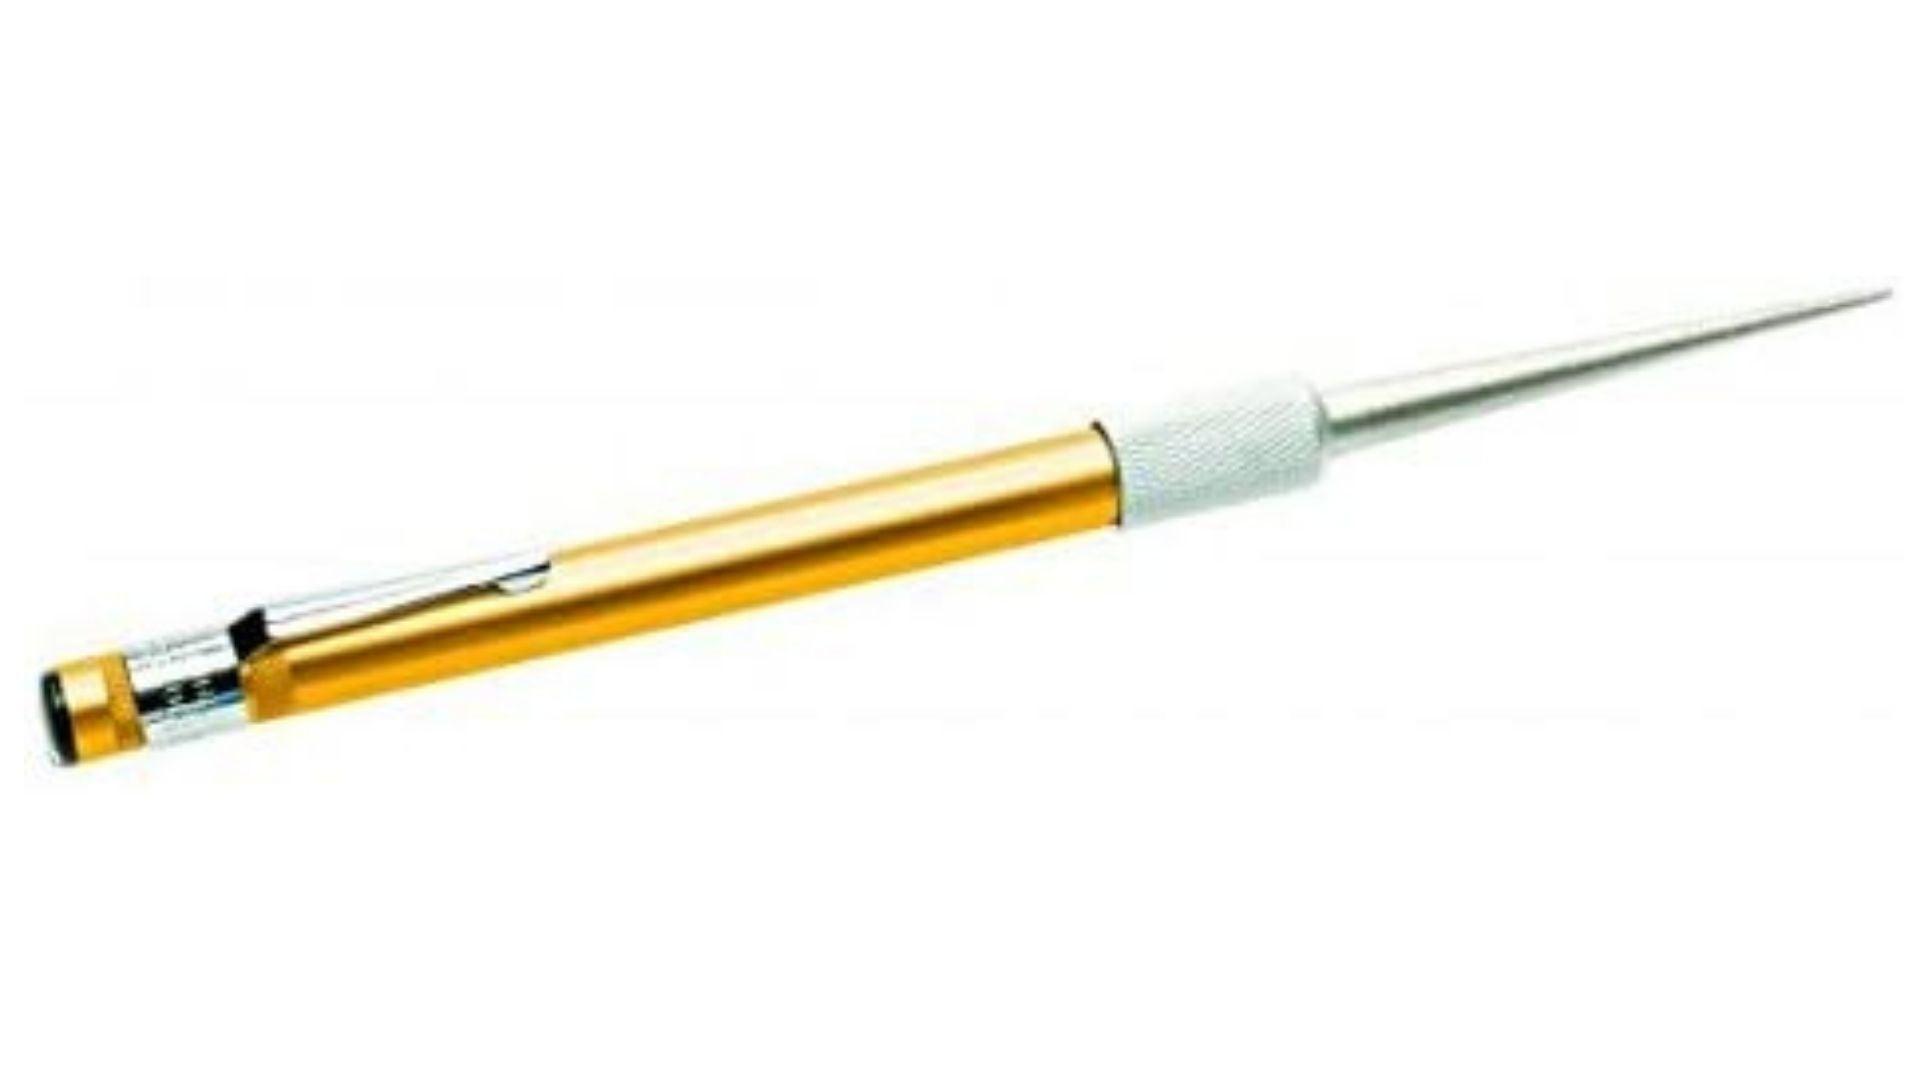 Smith's DRET Diamond Retractable Sharpener